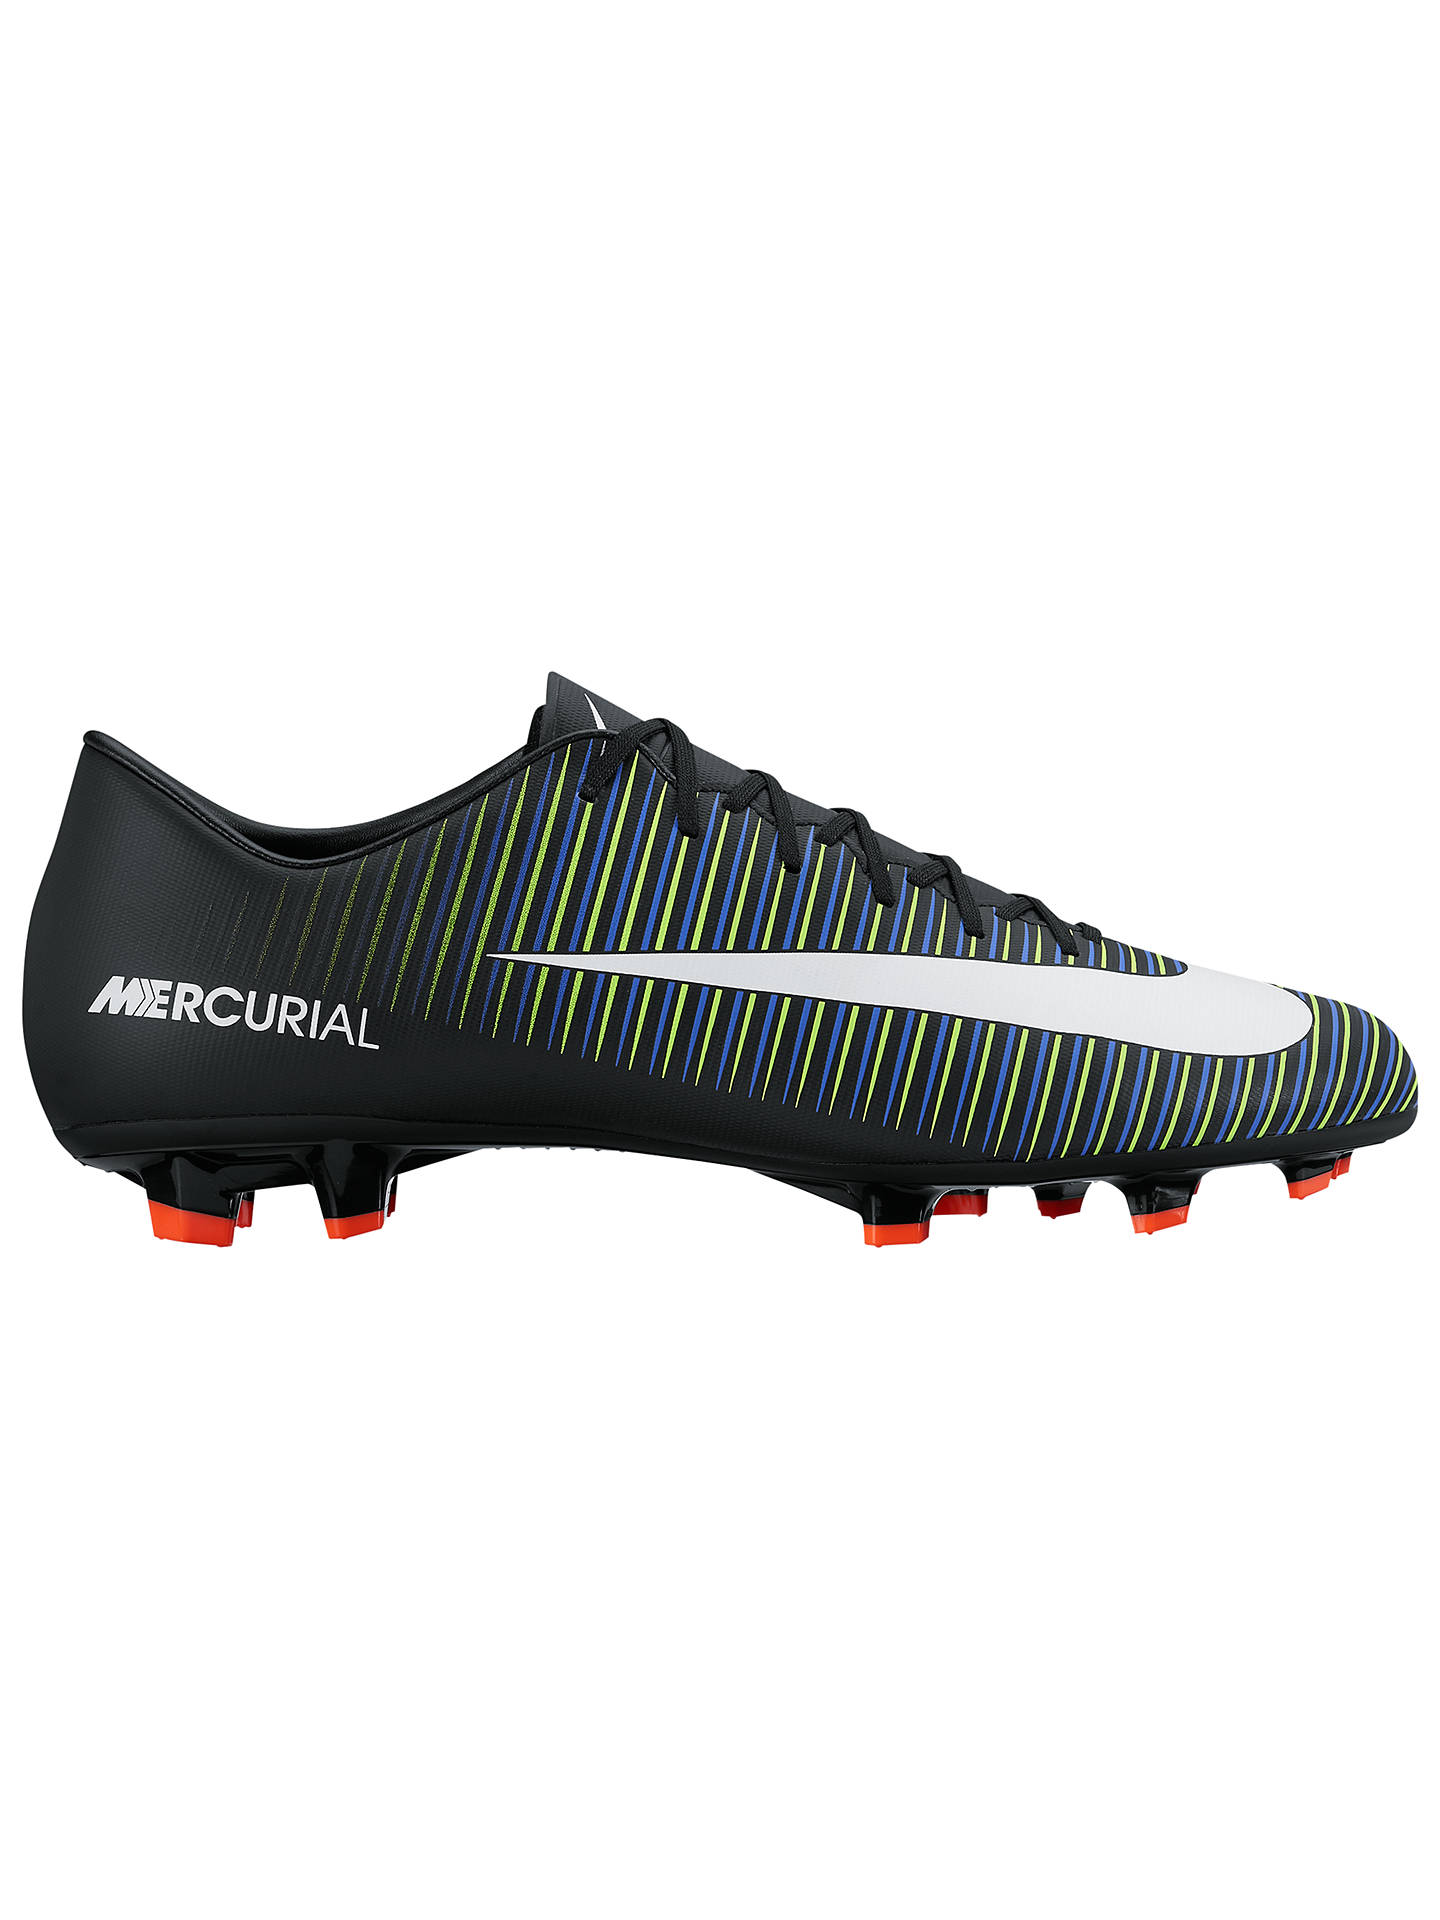 huge discount 1f761 7e007 Nike Mercurial Victory VI FG Men's Football Boots, Black ...